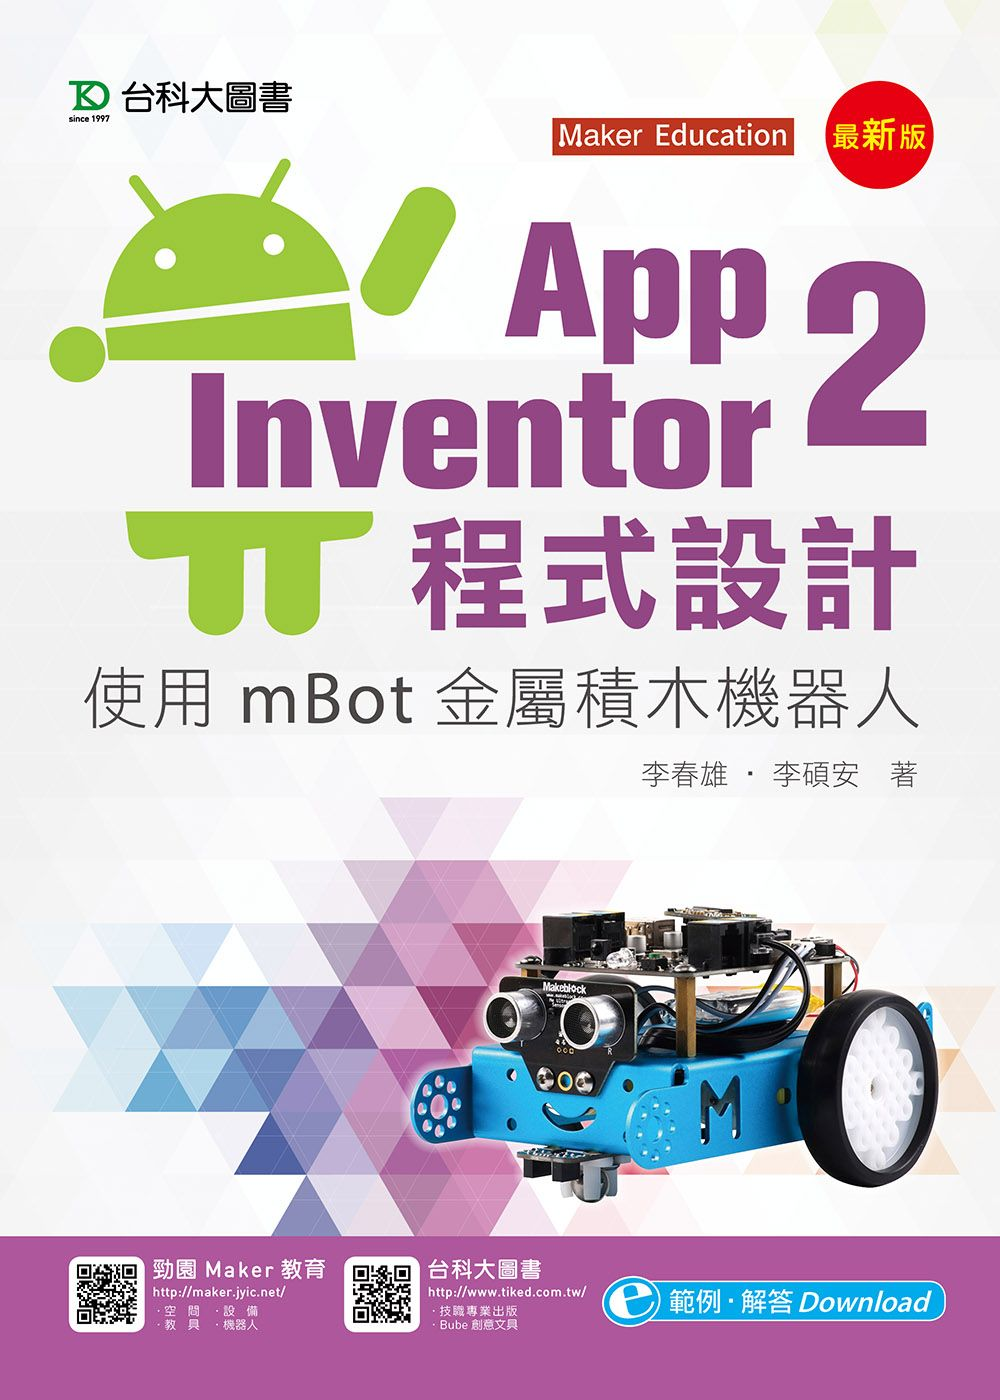 PB108-App Inventor 2程式設計 - 使用mBot金屬積木機器人 - 最新版 | P